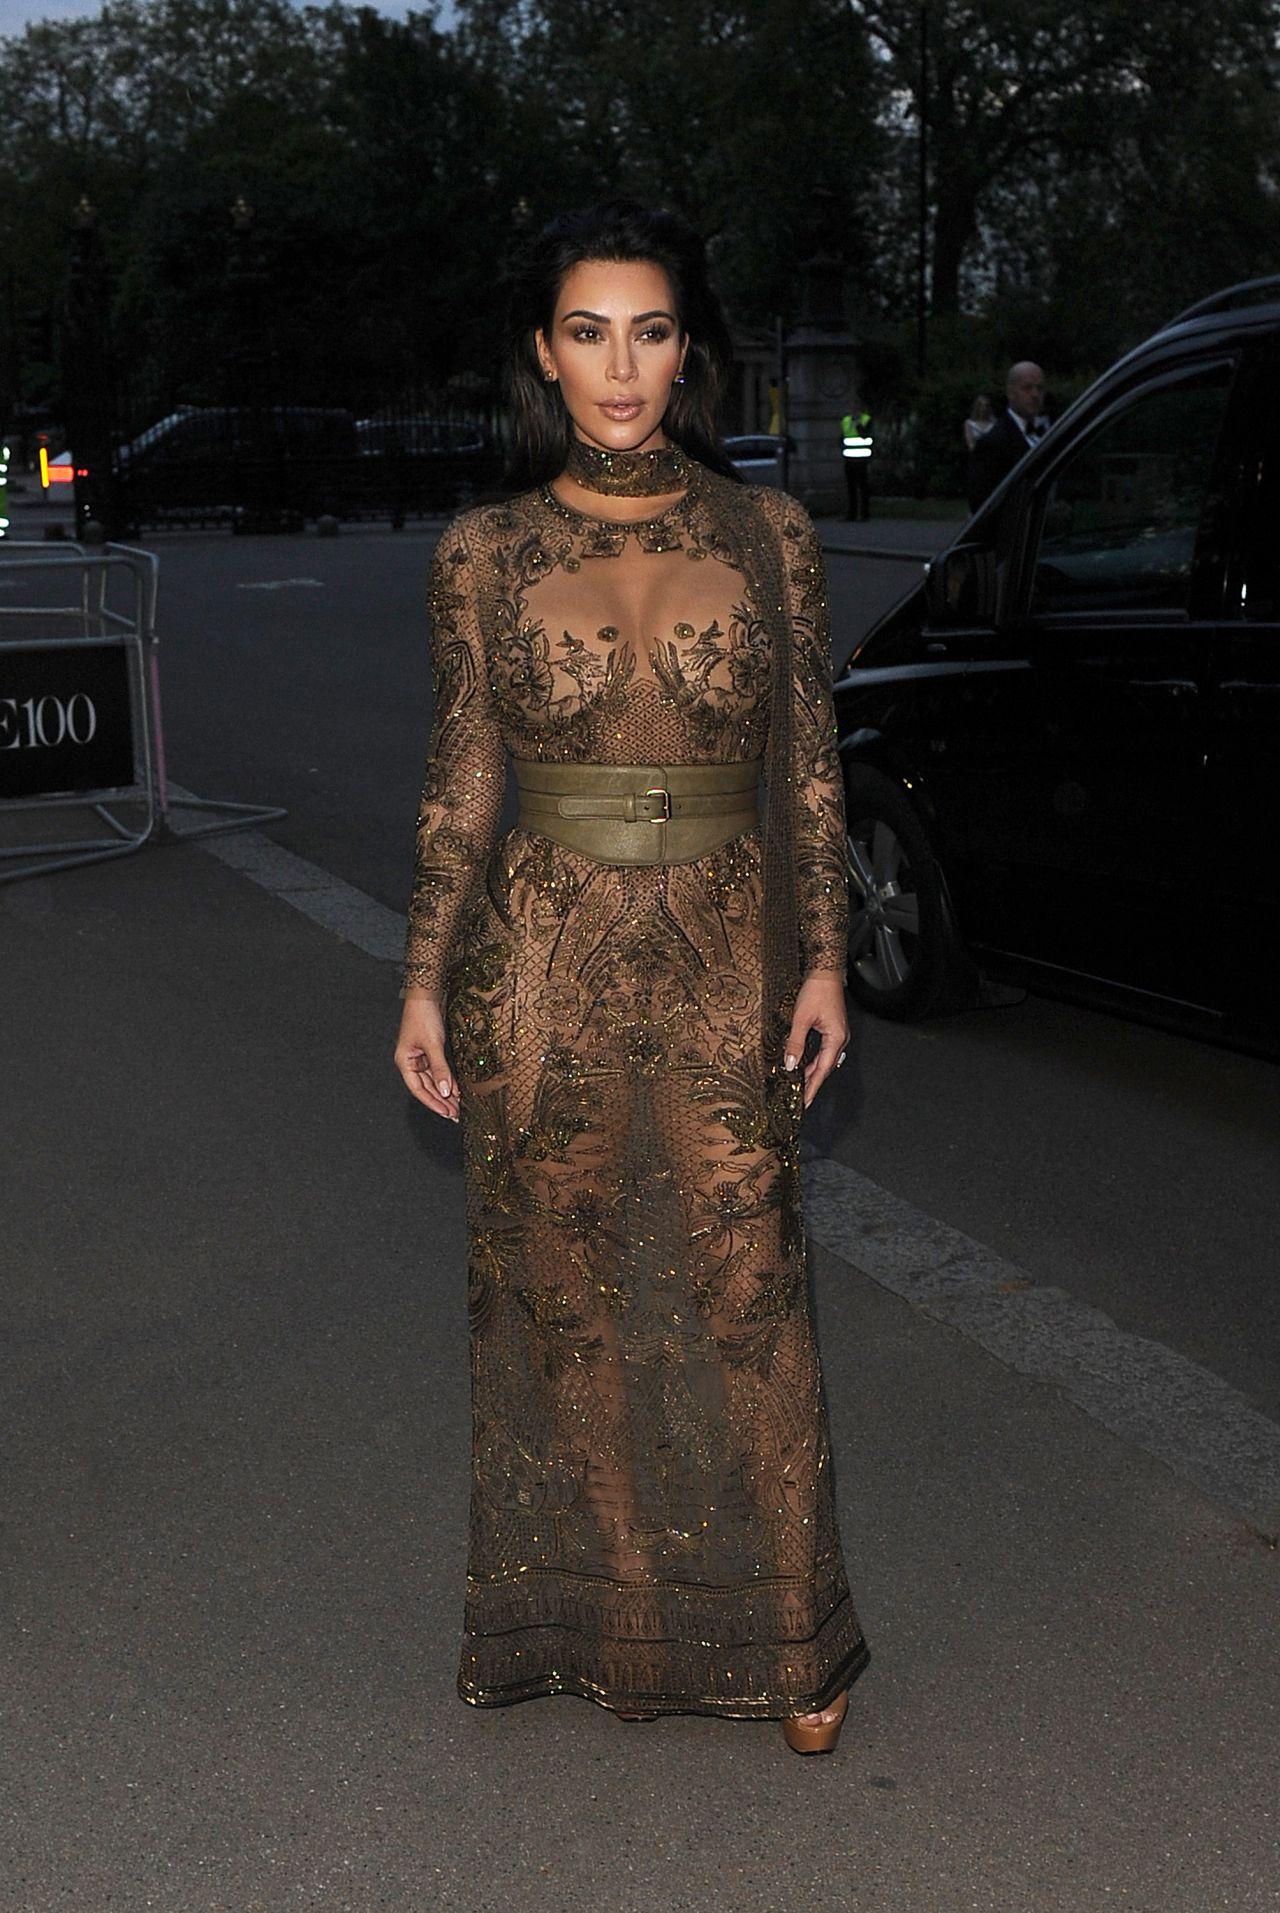 Kim Kardashian Leaves Little to the Imagination in Sheer